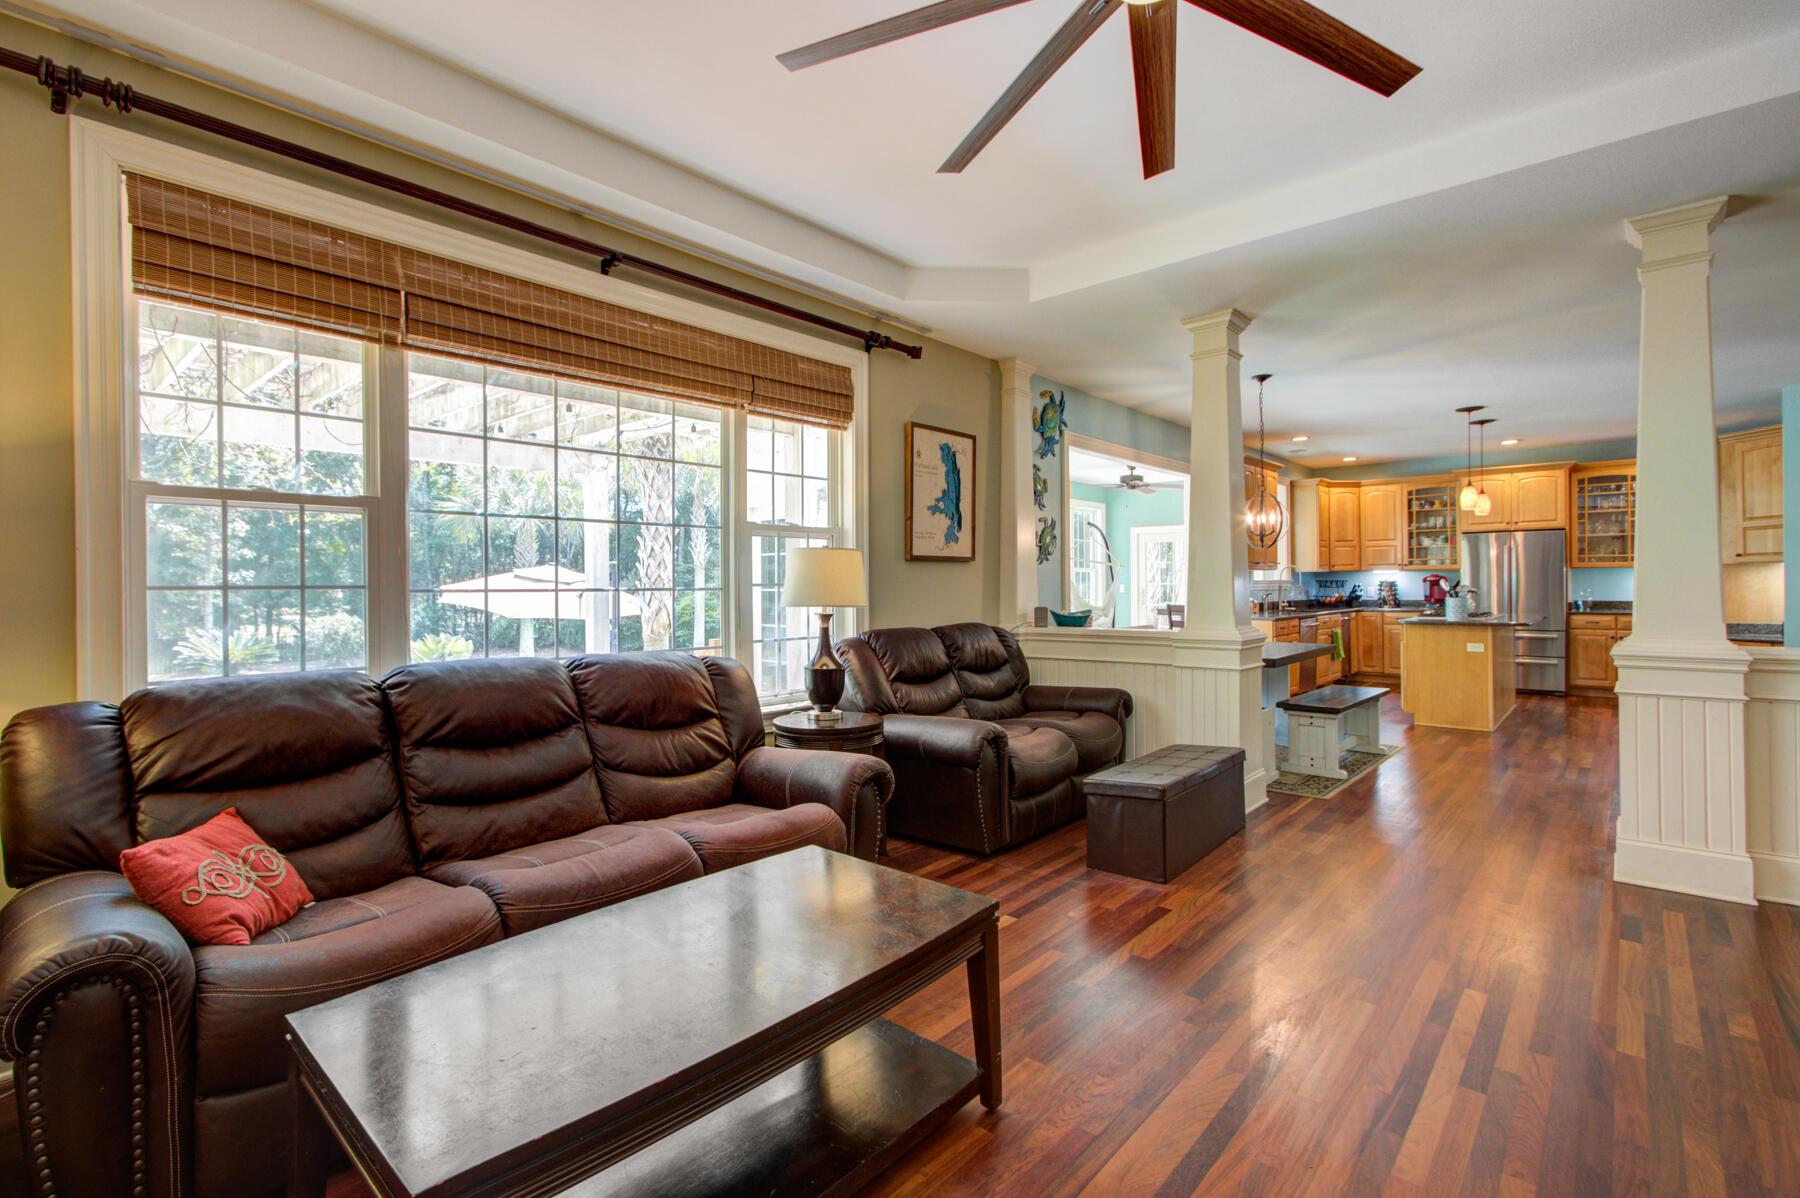 Dunes West Homes For Sale - 3095 Pignatelli, Mount Pleasant, SC - 12